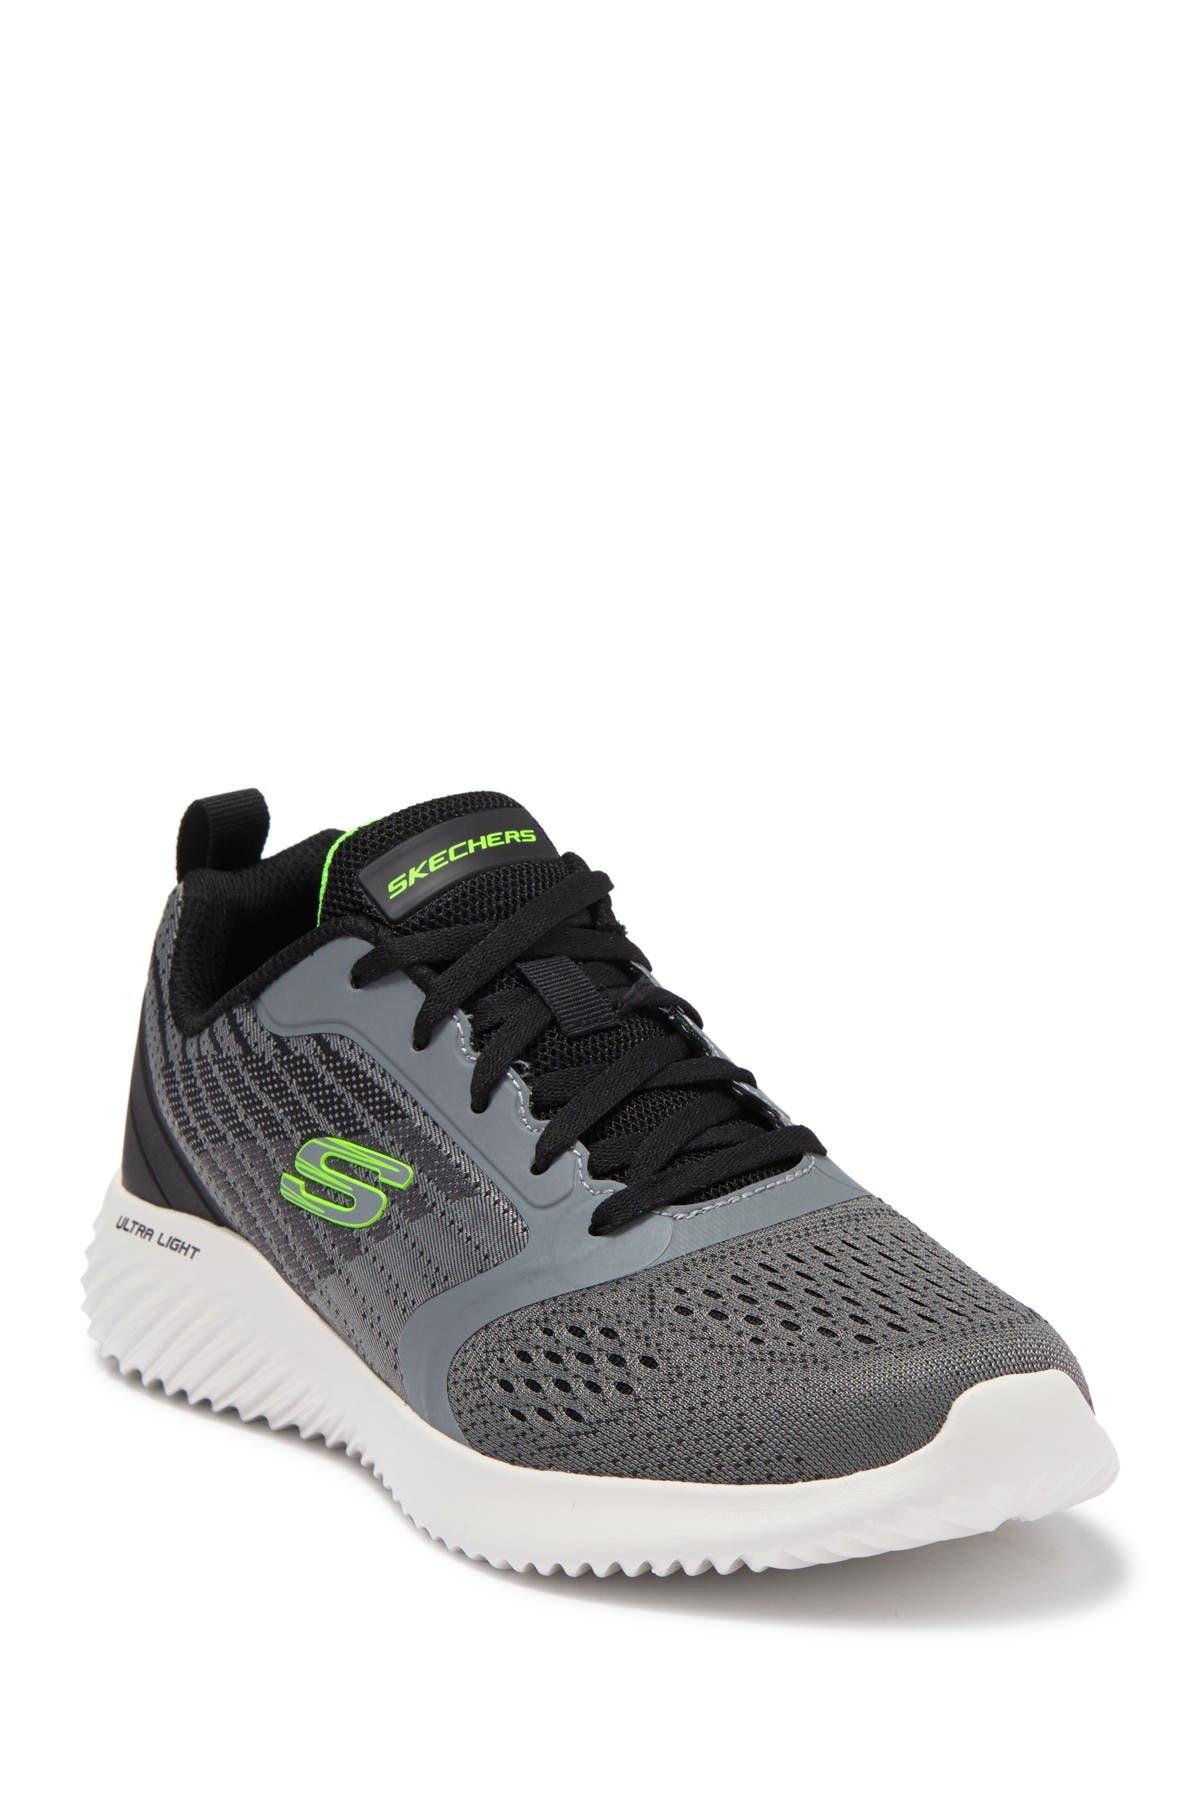 Image of Skechers Bounder Verkona Sneaker